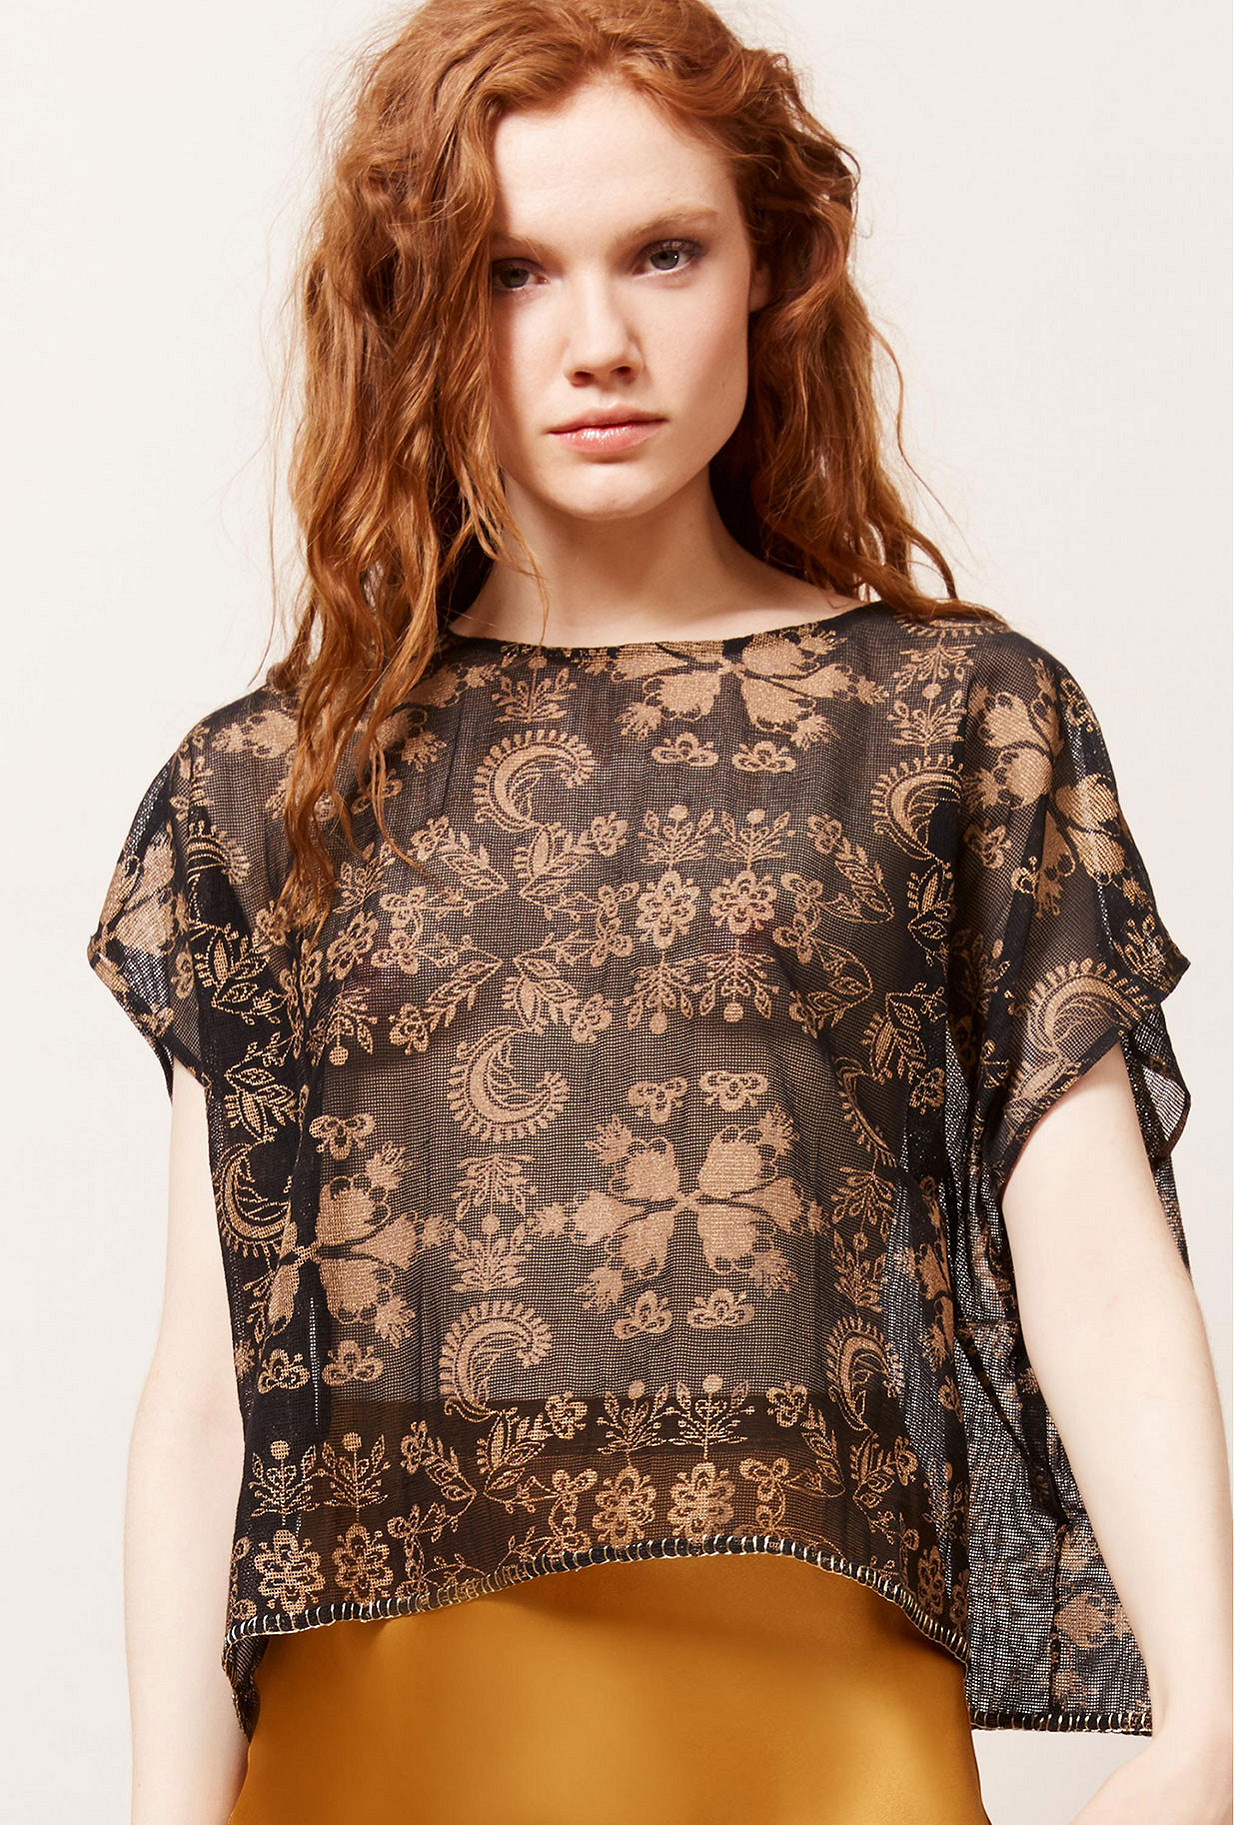 Paris clothes store Top  Attila french designer fashion Paris